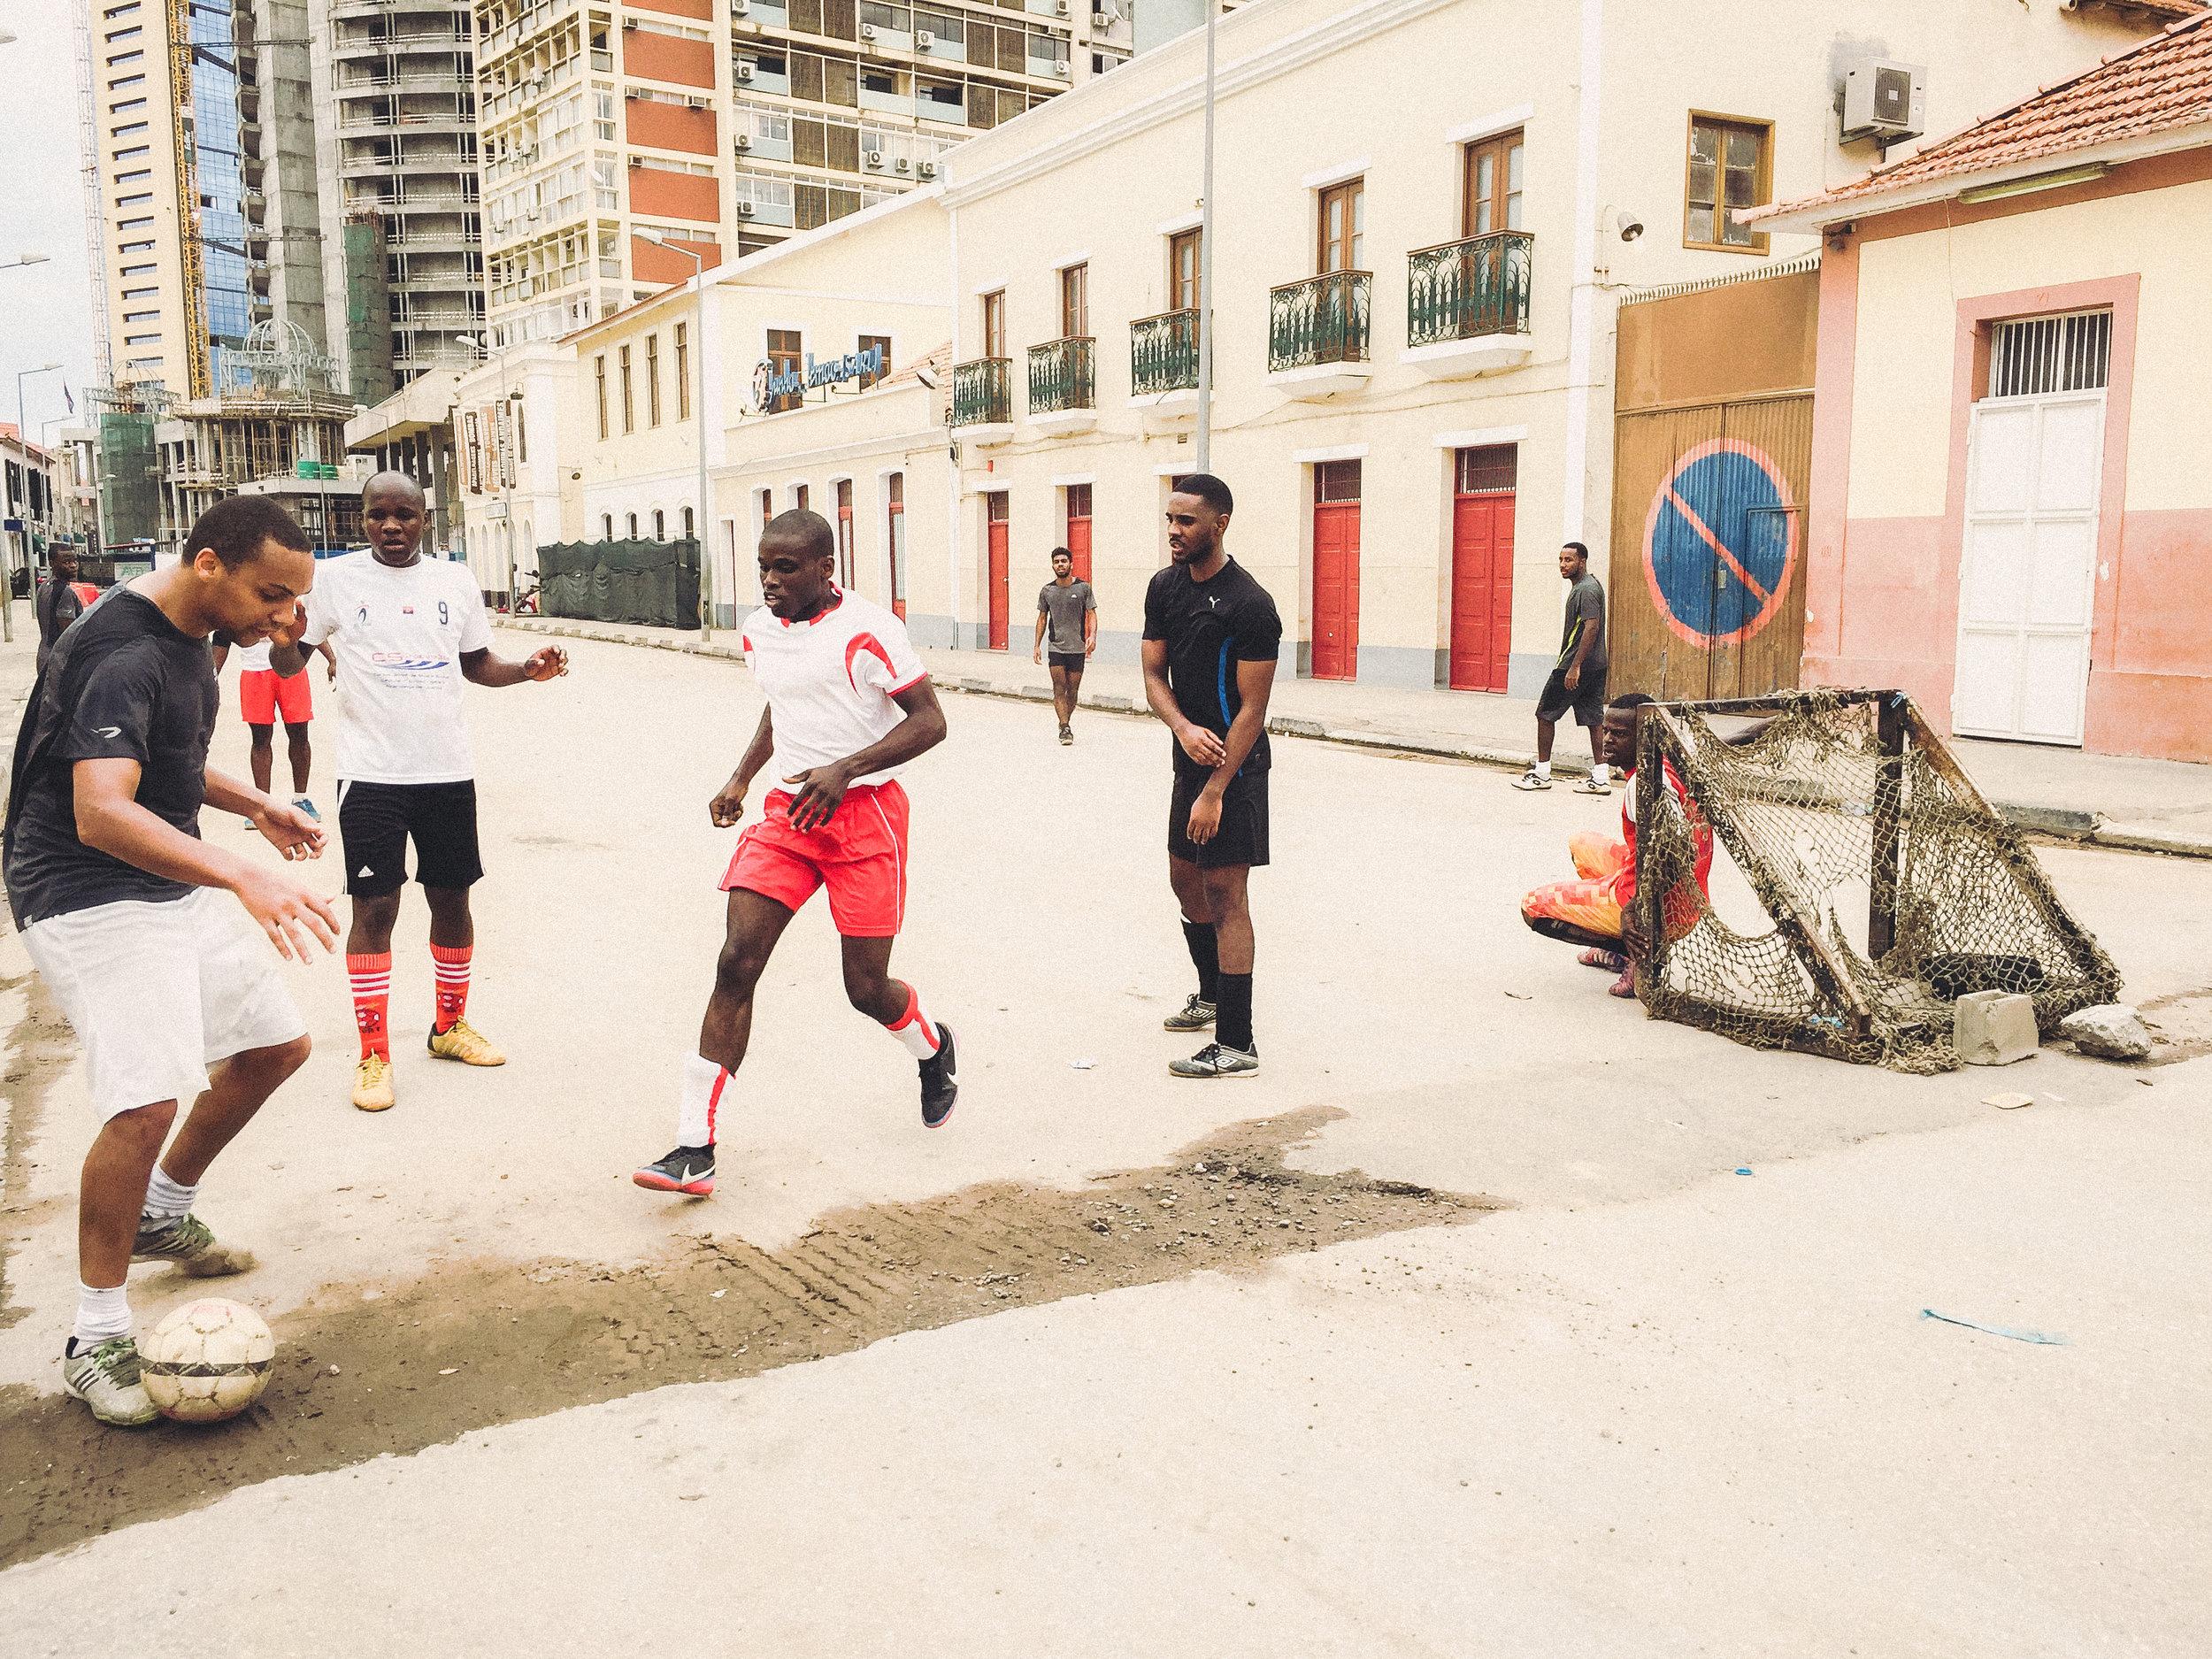 Angola Soccer by Mel D. Cole 2015-13.jpg